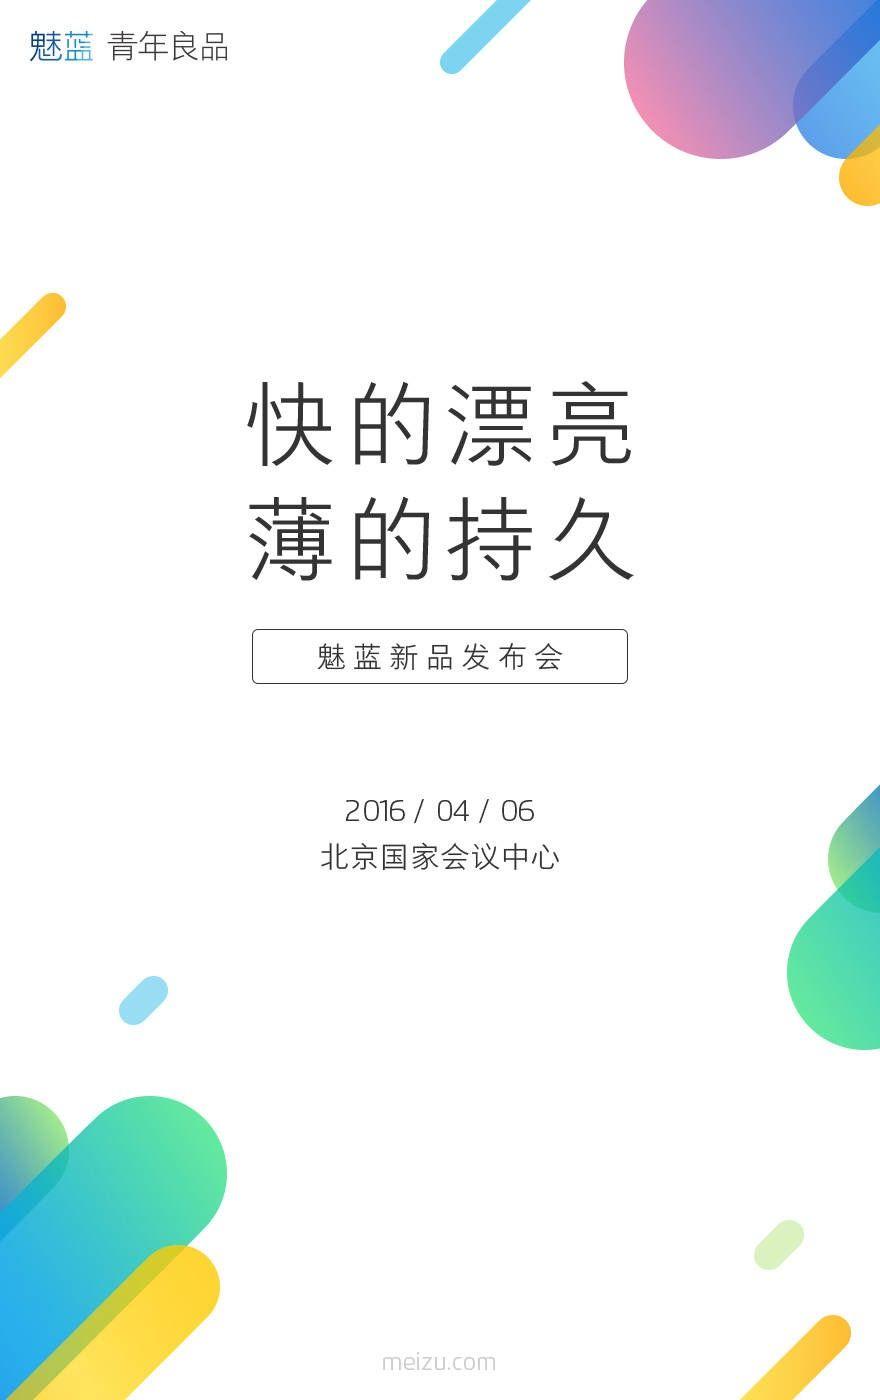 Meizu m3 noteの発表会を4月6日に開催。自動車メーカーTESLAのModel Sが載っている招待状を配布